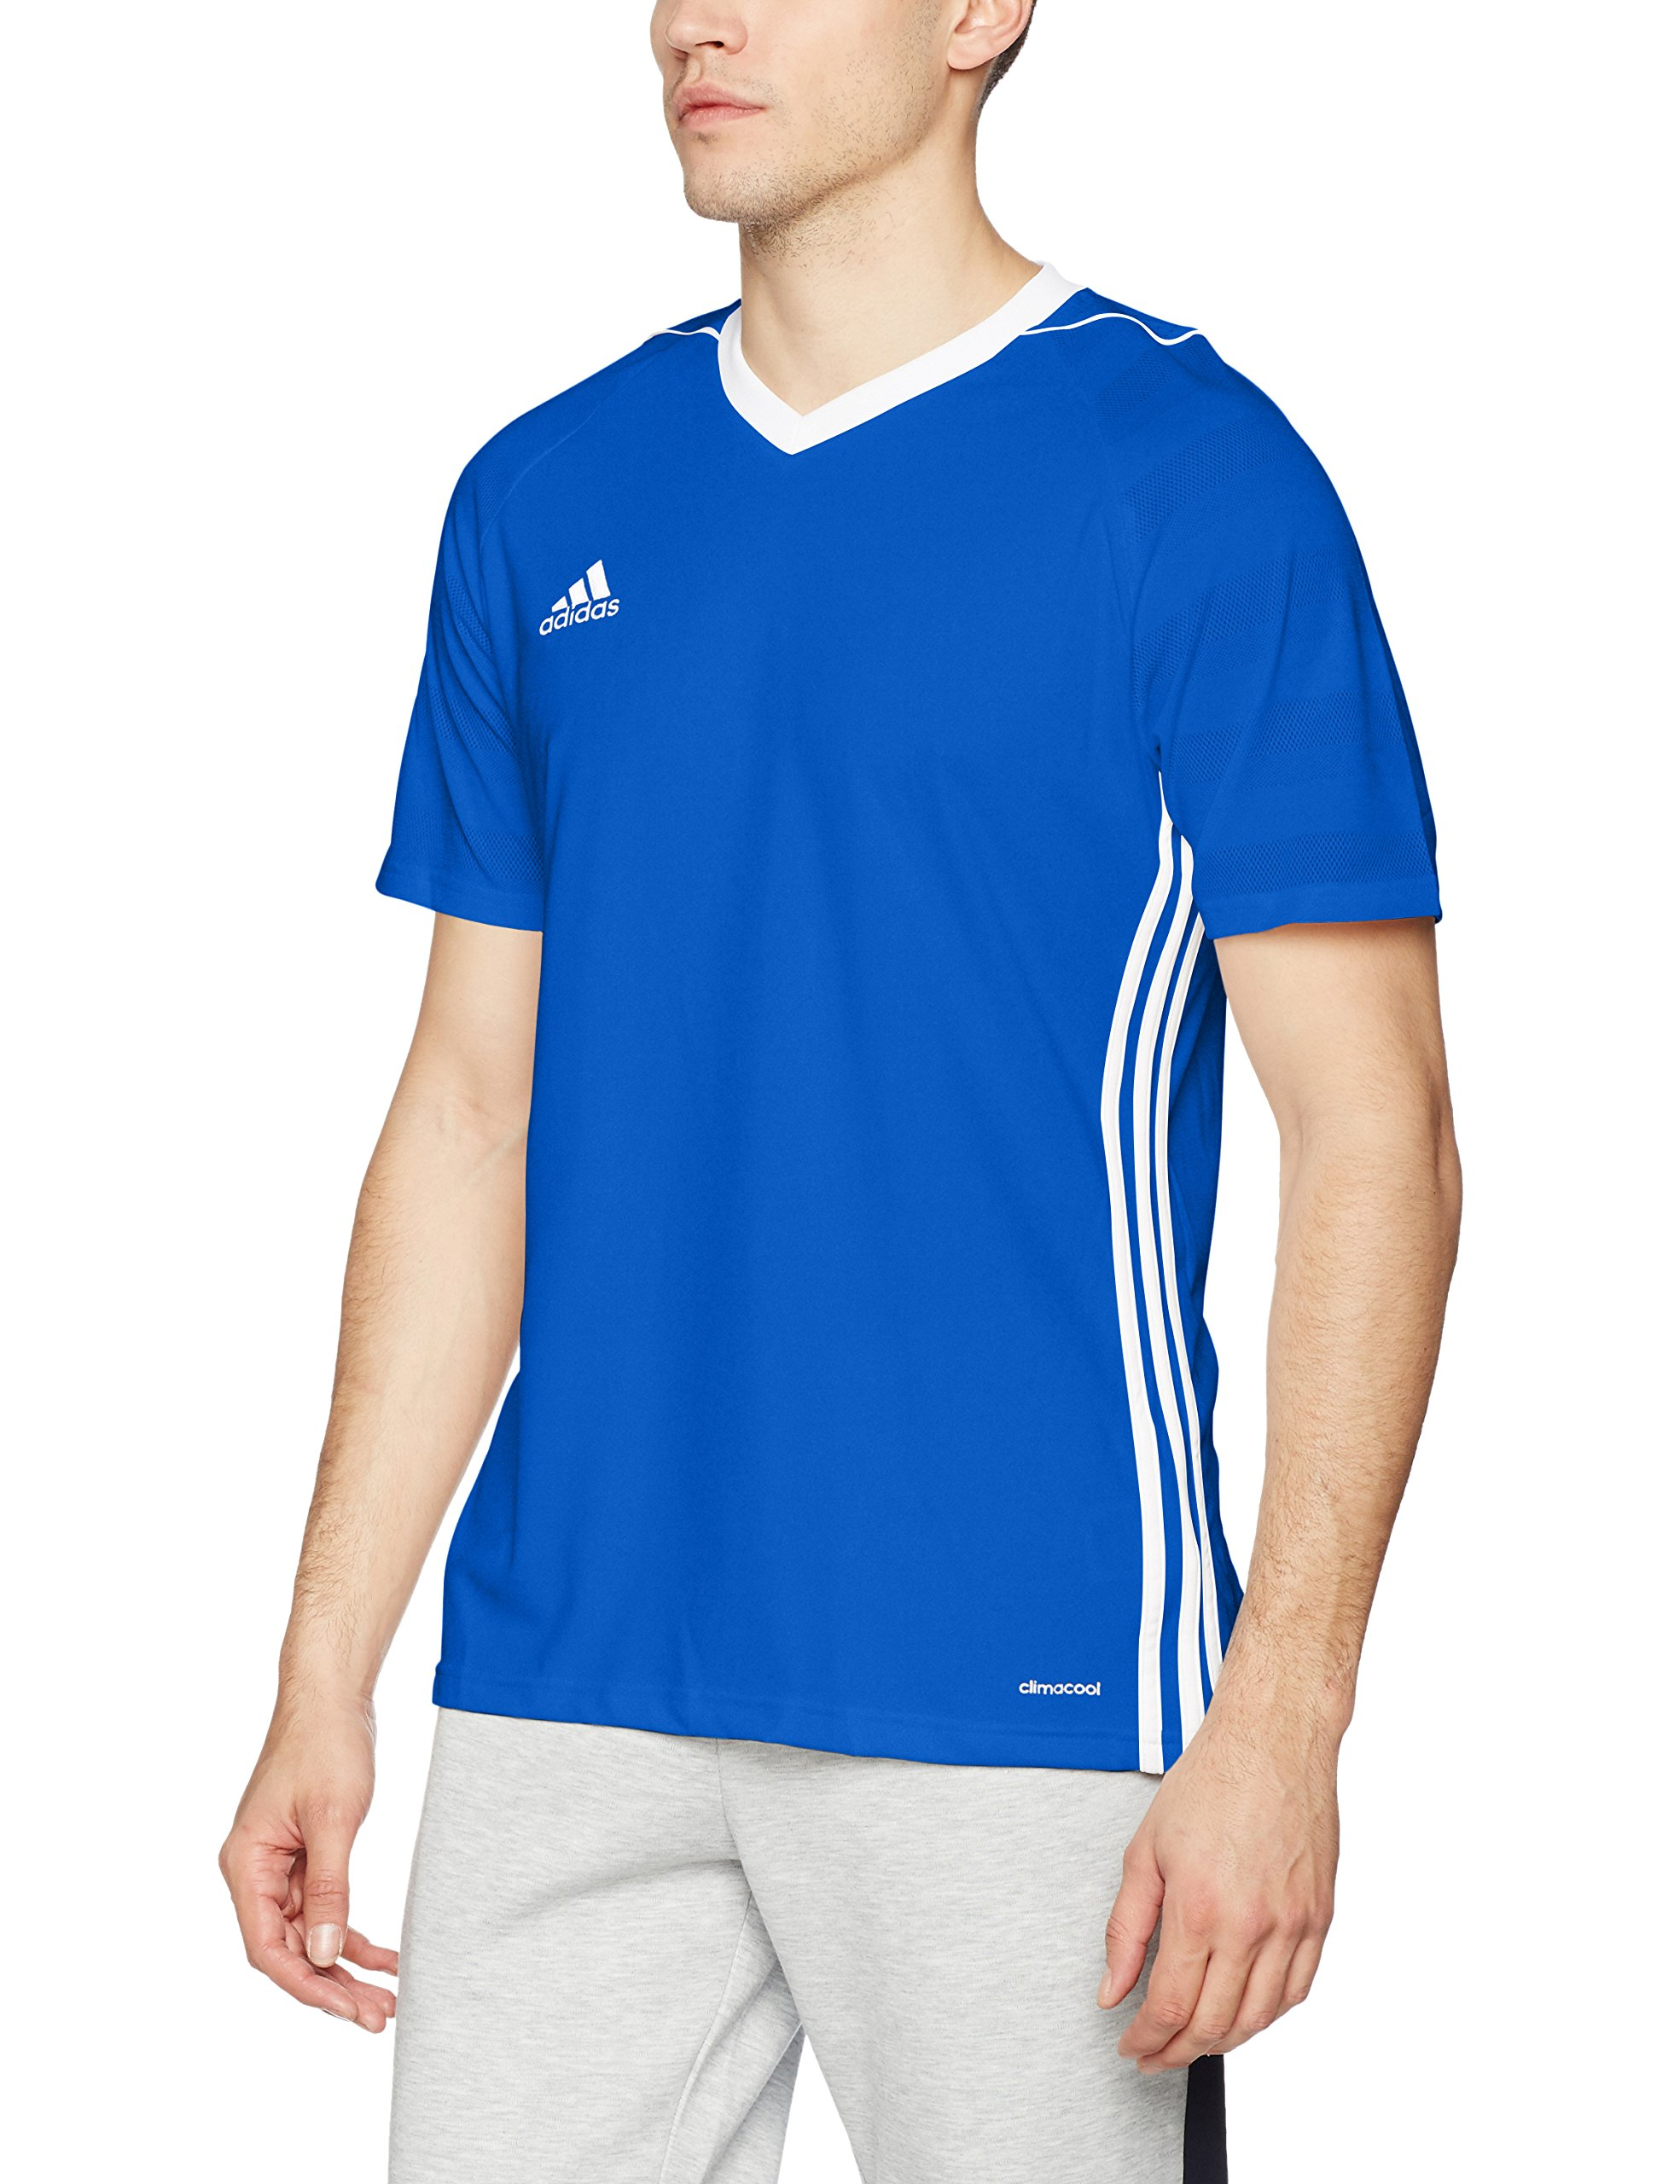 adidas Tiro 17 JSY Camiseta de Manga Corta, Hombre, Azul (Azufue/Blanco